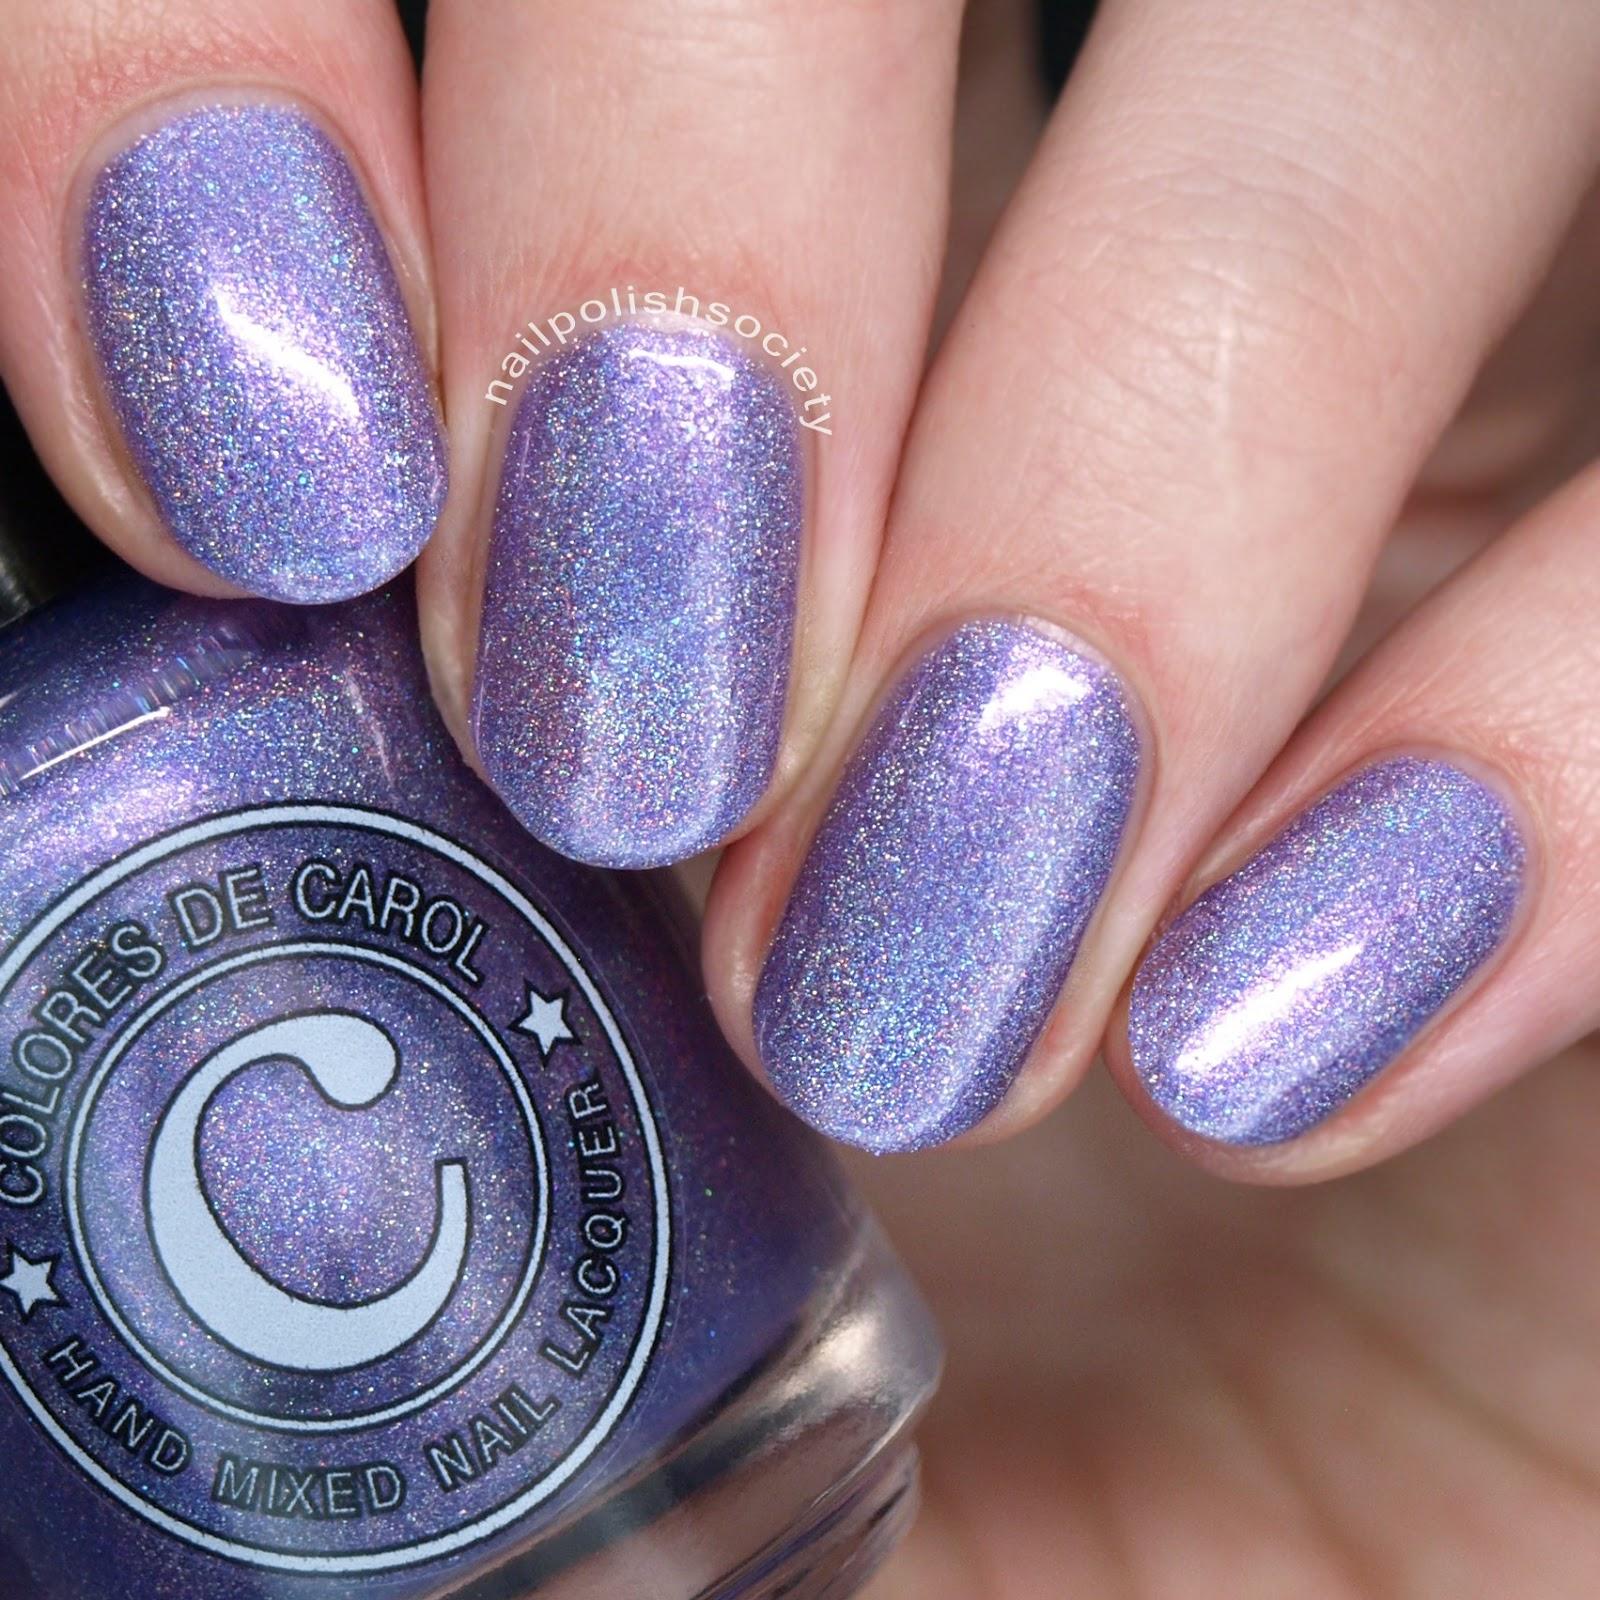 Nail Polish Society: Colores de Carol Pure Imagination Collection